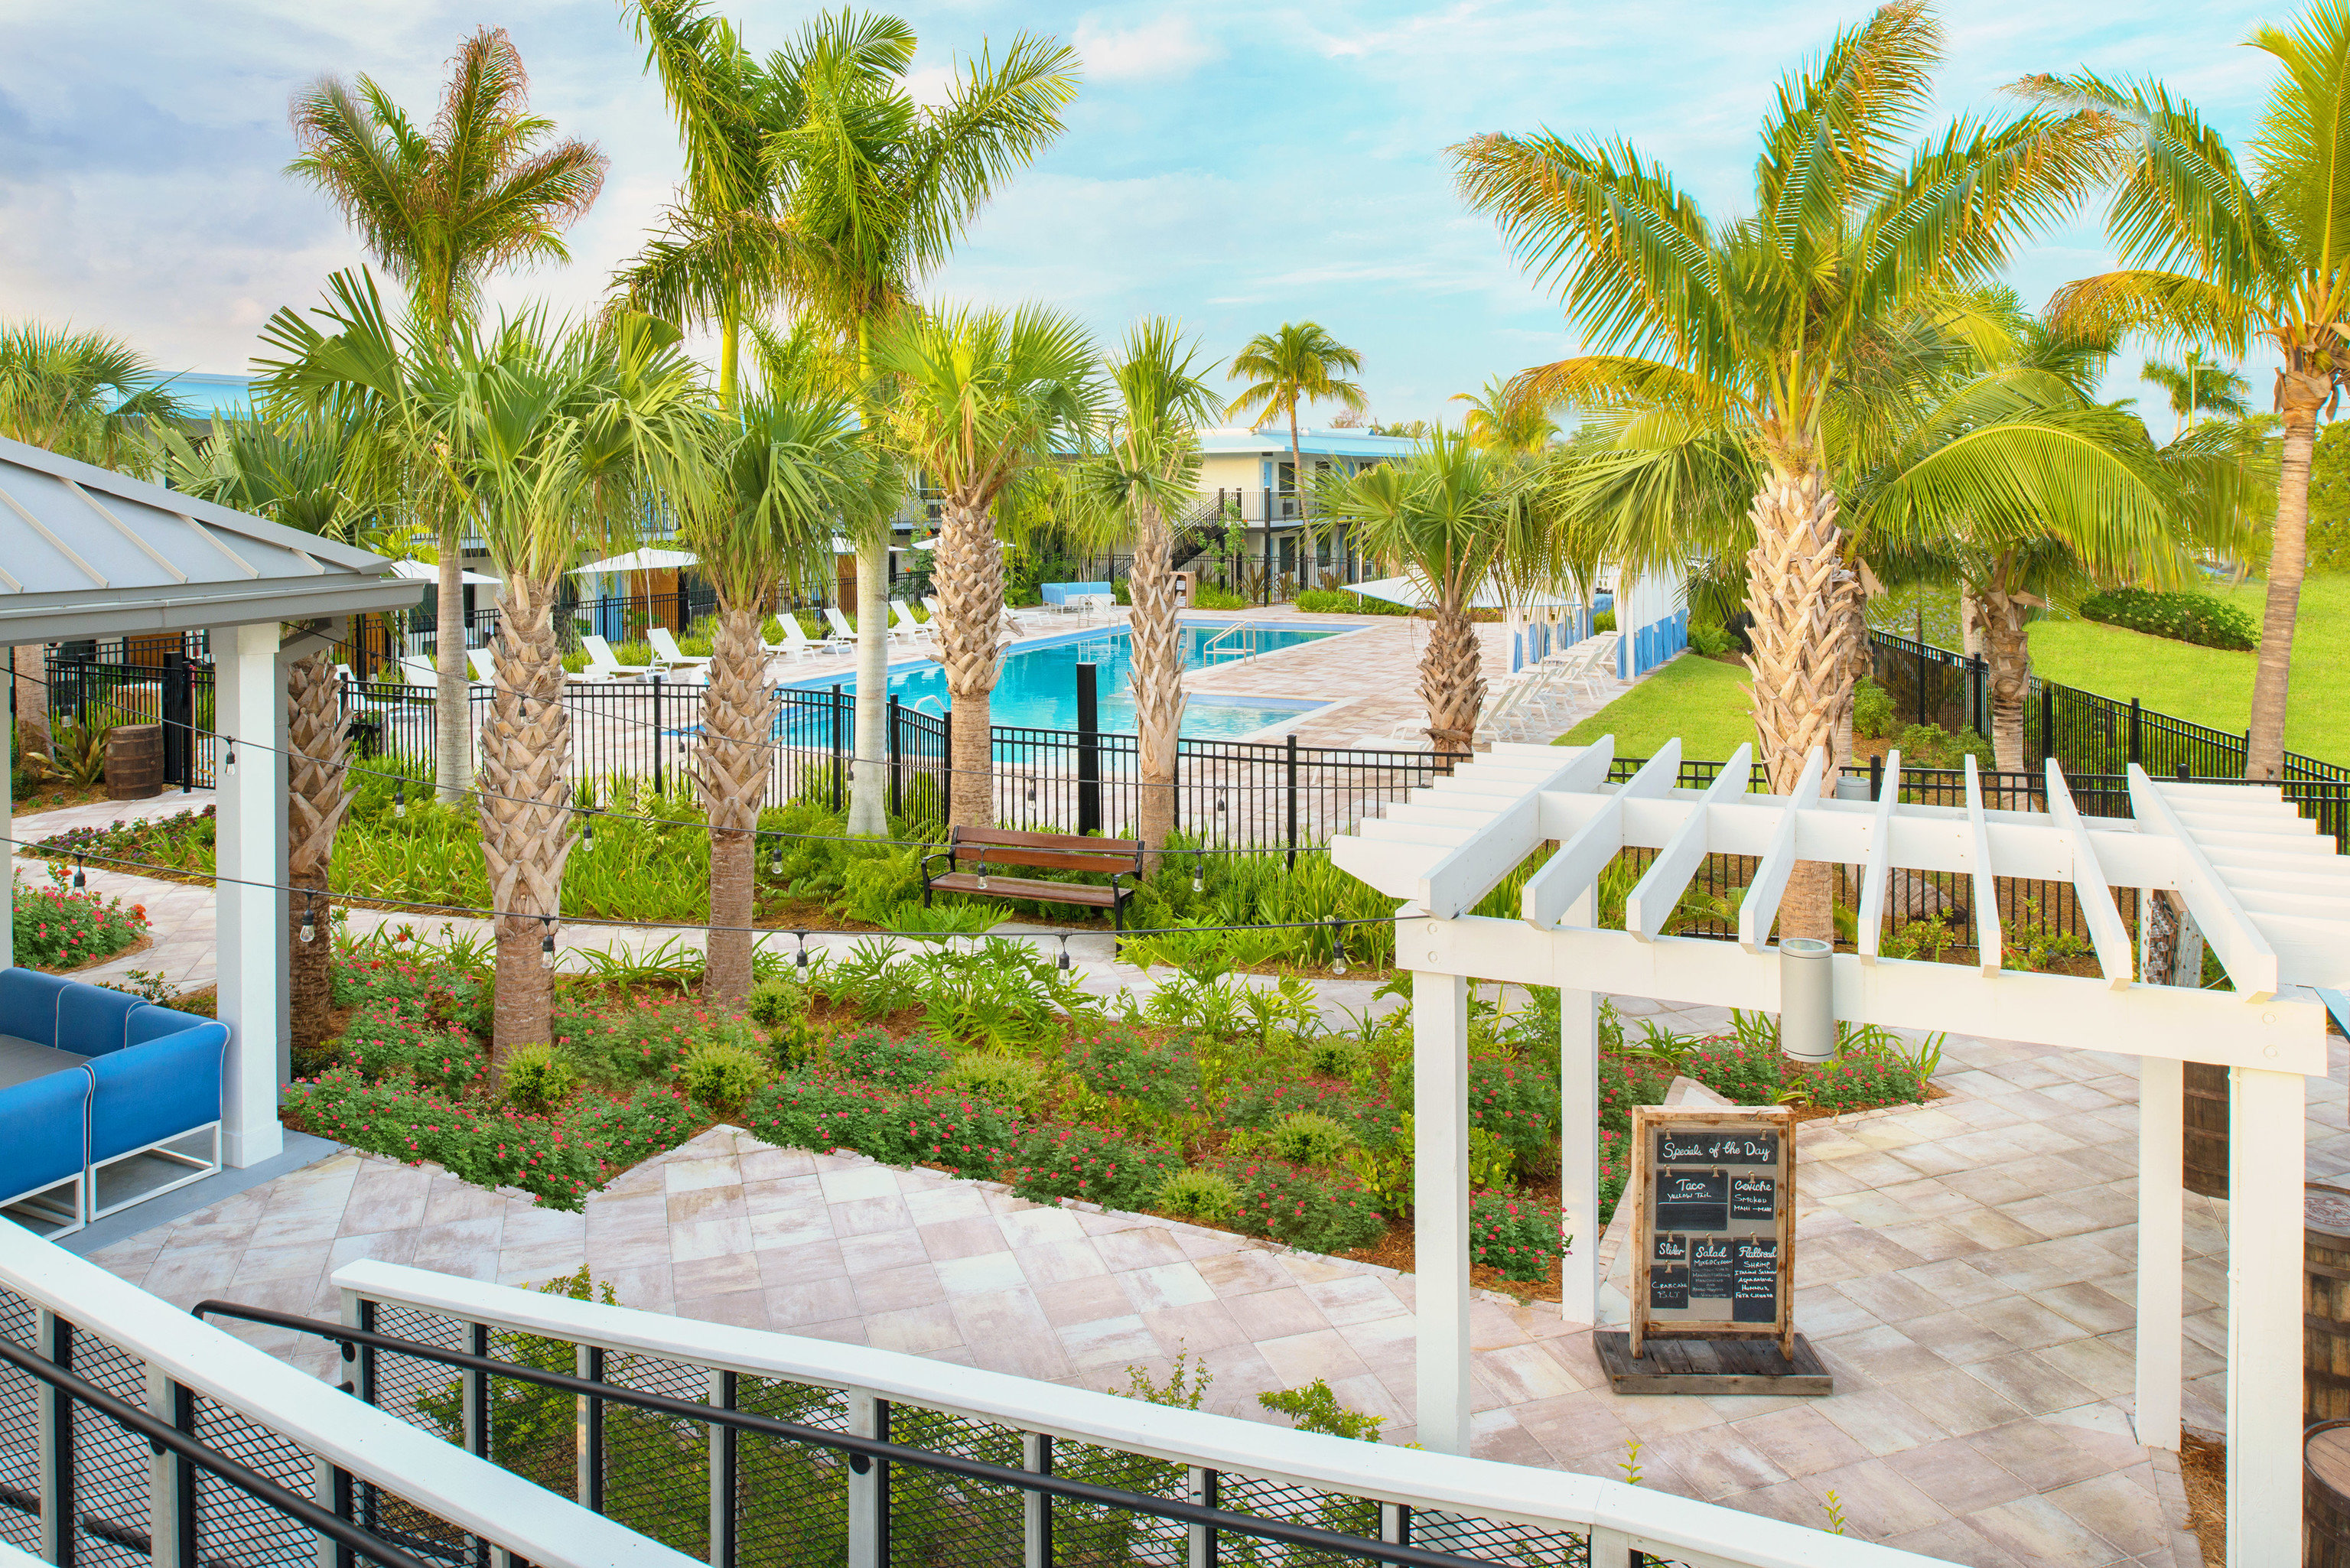 tree sky leisure property Resort palm swimming pool walkway home backyard Villa Garden